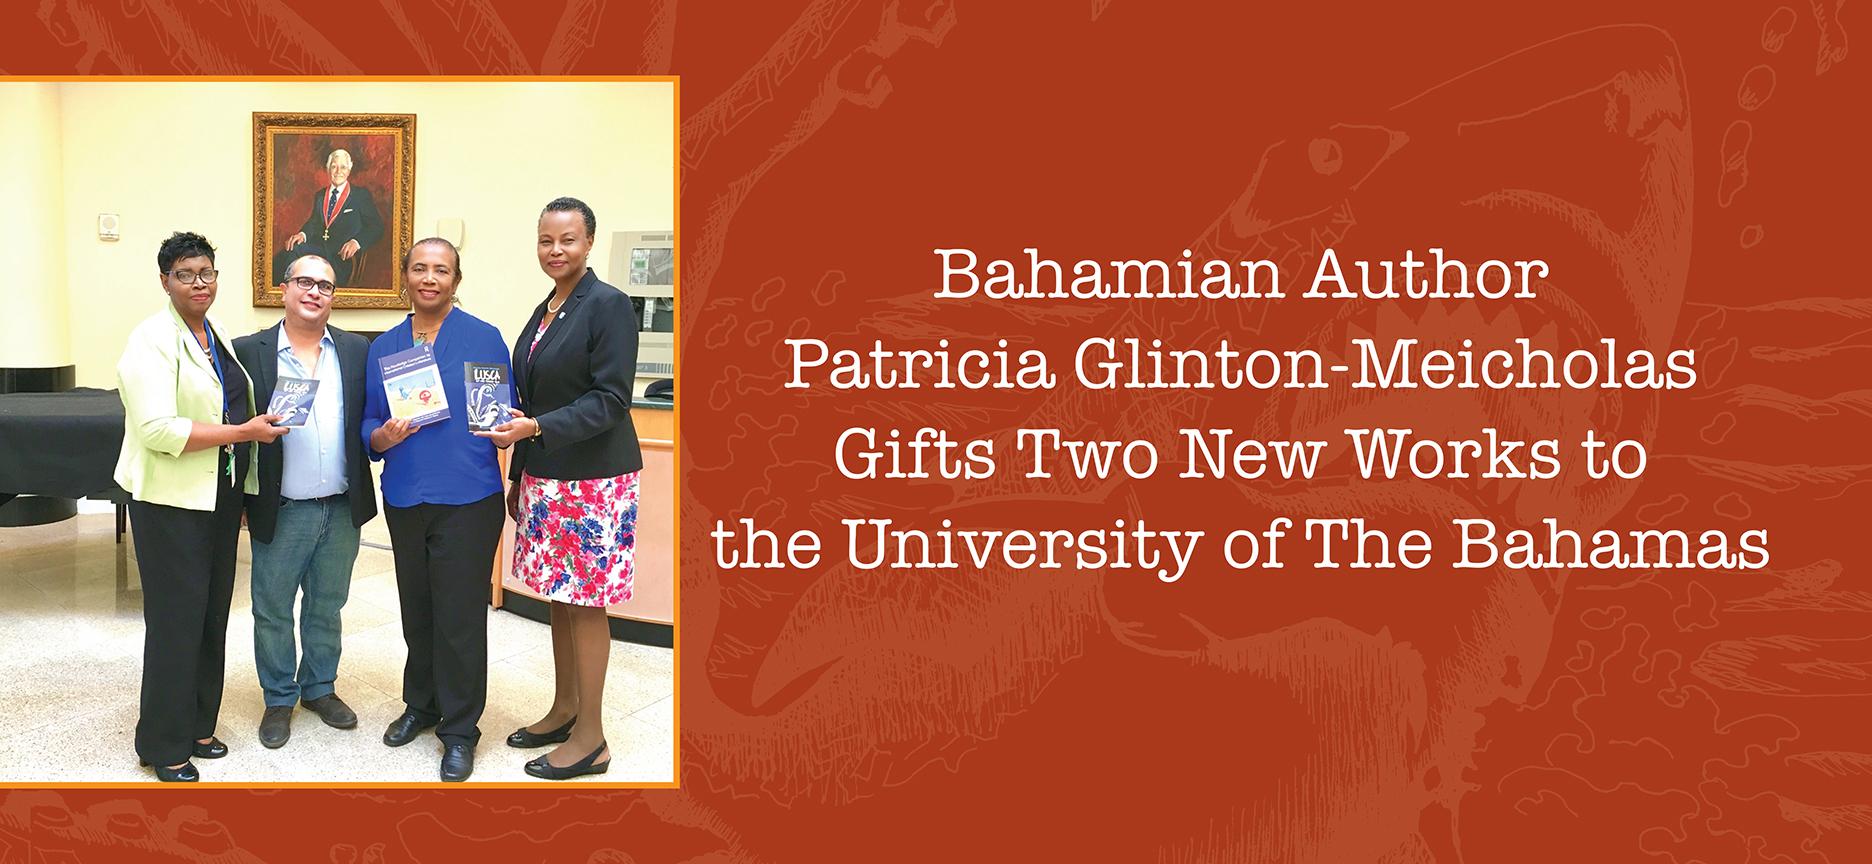 Shown in photograph (l to r) Bertha-Mae Walker, PhD, university librarian, University of The Bahamas; Neko Meicholas, publisher Guanima Press Ltd; Patricia Glinton-Meicholas and Linda Davis, PhD, provost, University of The Bahamas.